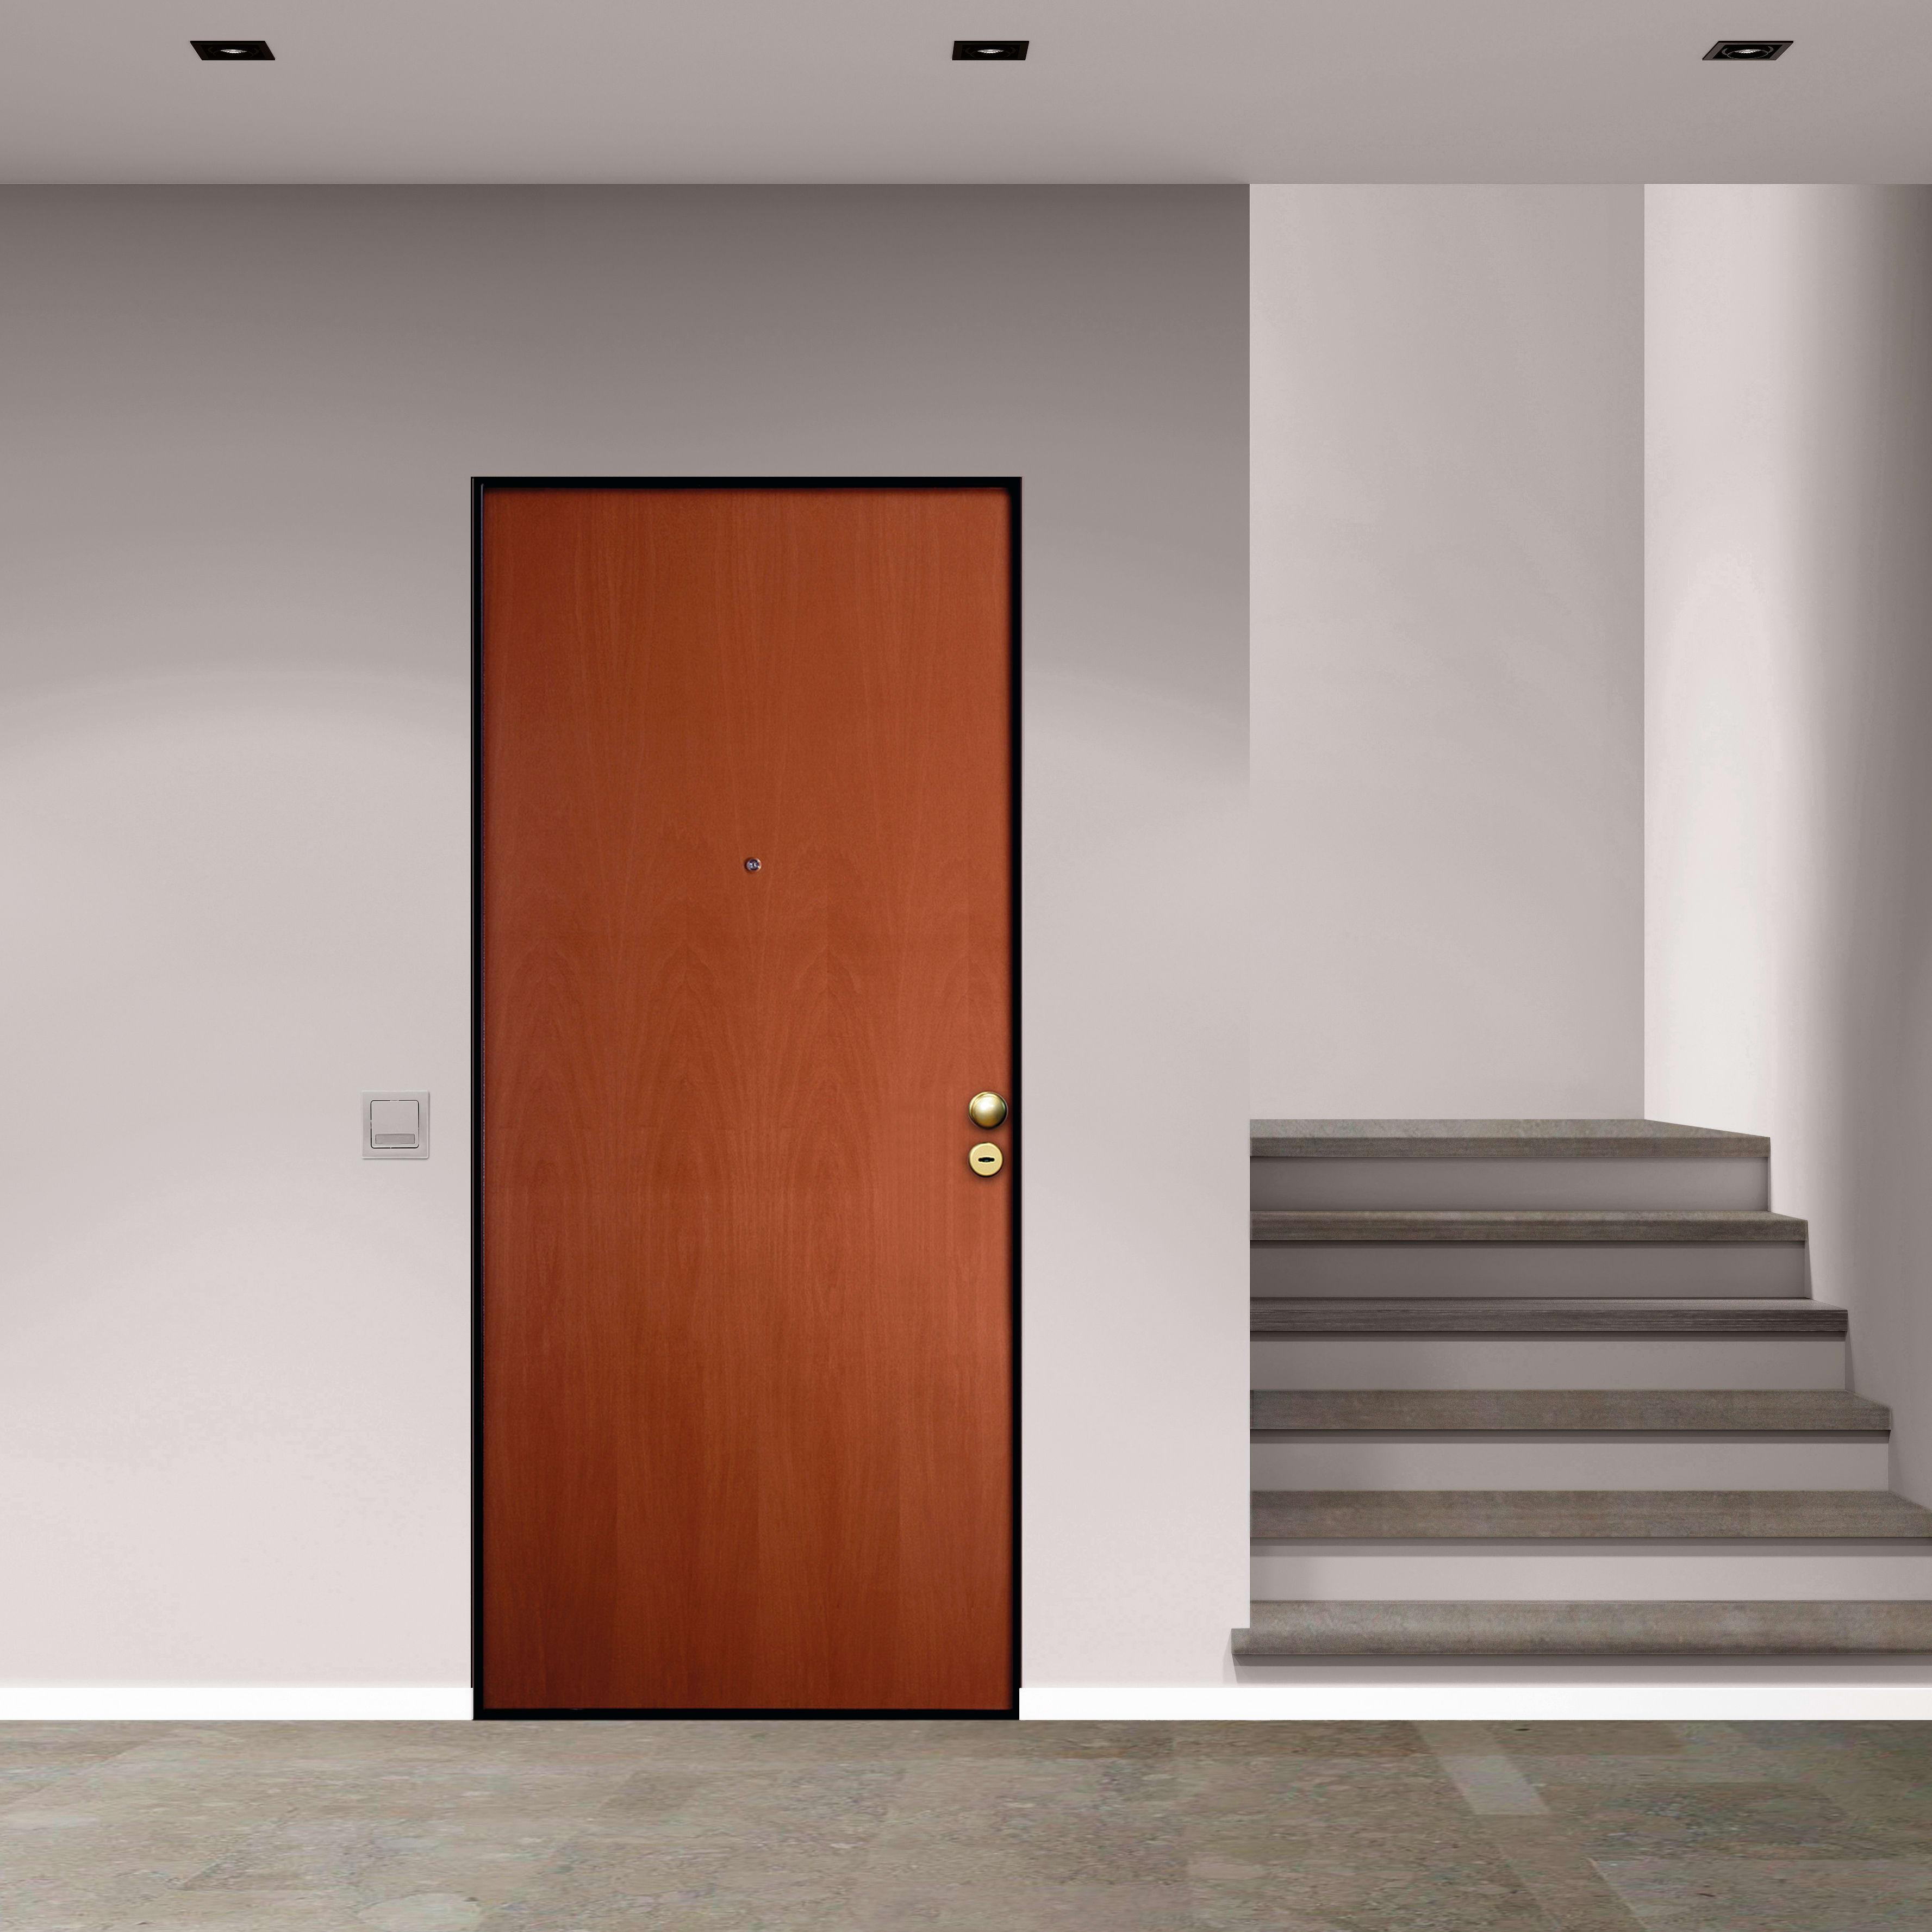 Sostituire Pannello Porta Blindata porta blindata good noce l 90 x h 210 cm sinistra